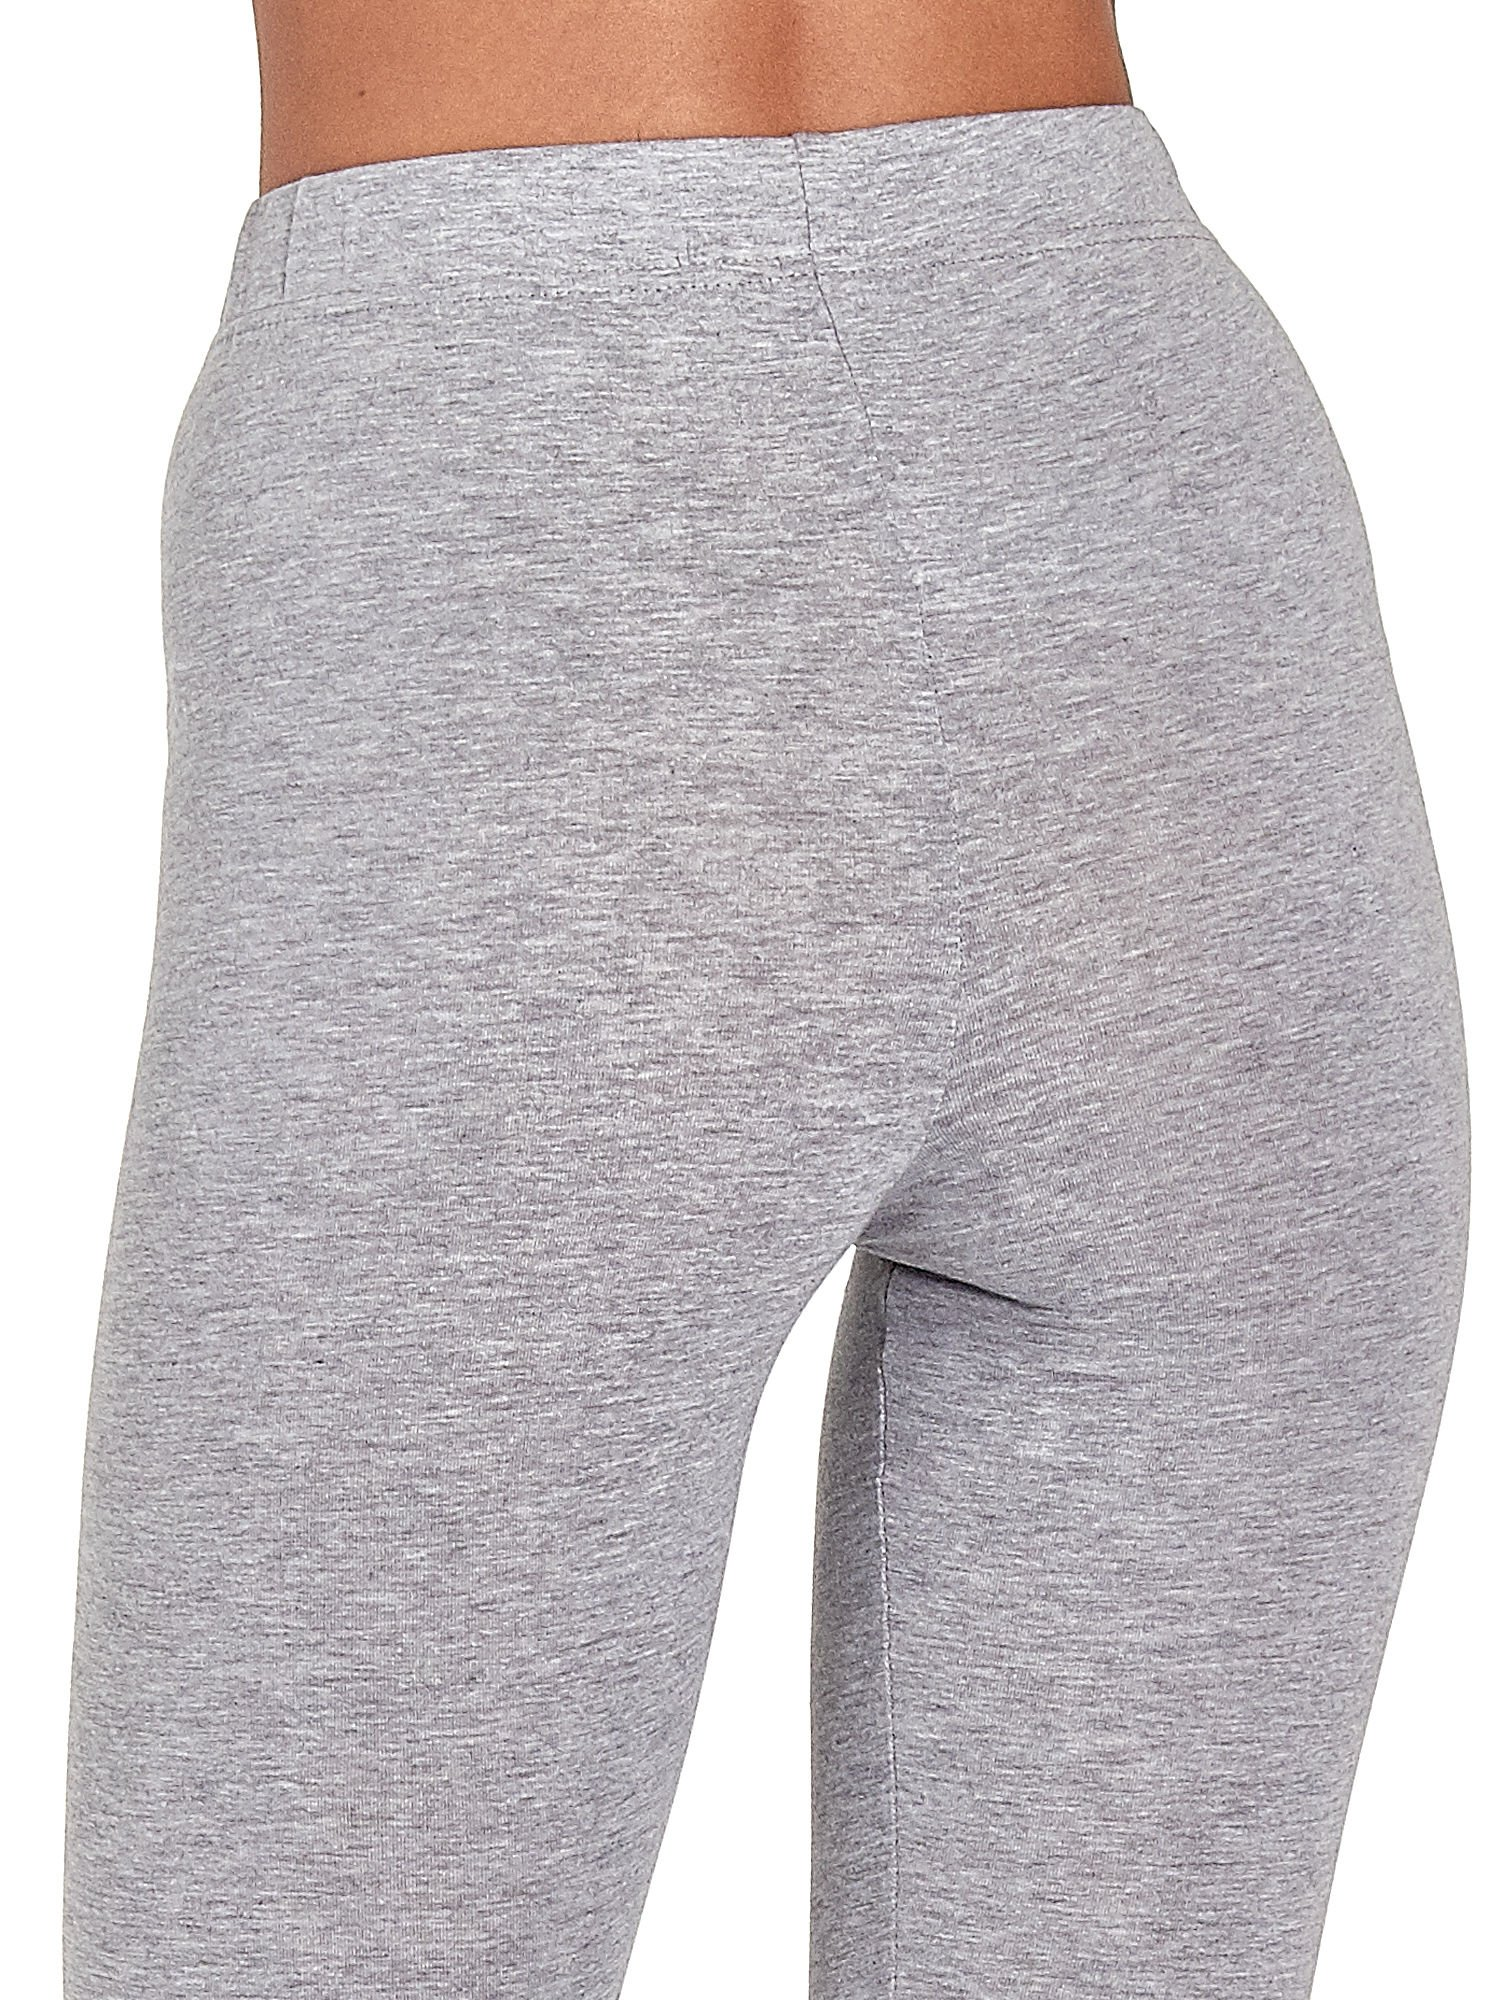 Szare melanżowe legginsy damskie basic                                  zdj.                                  7